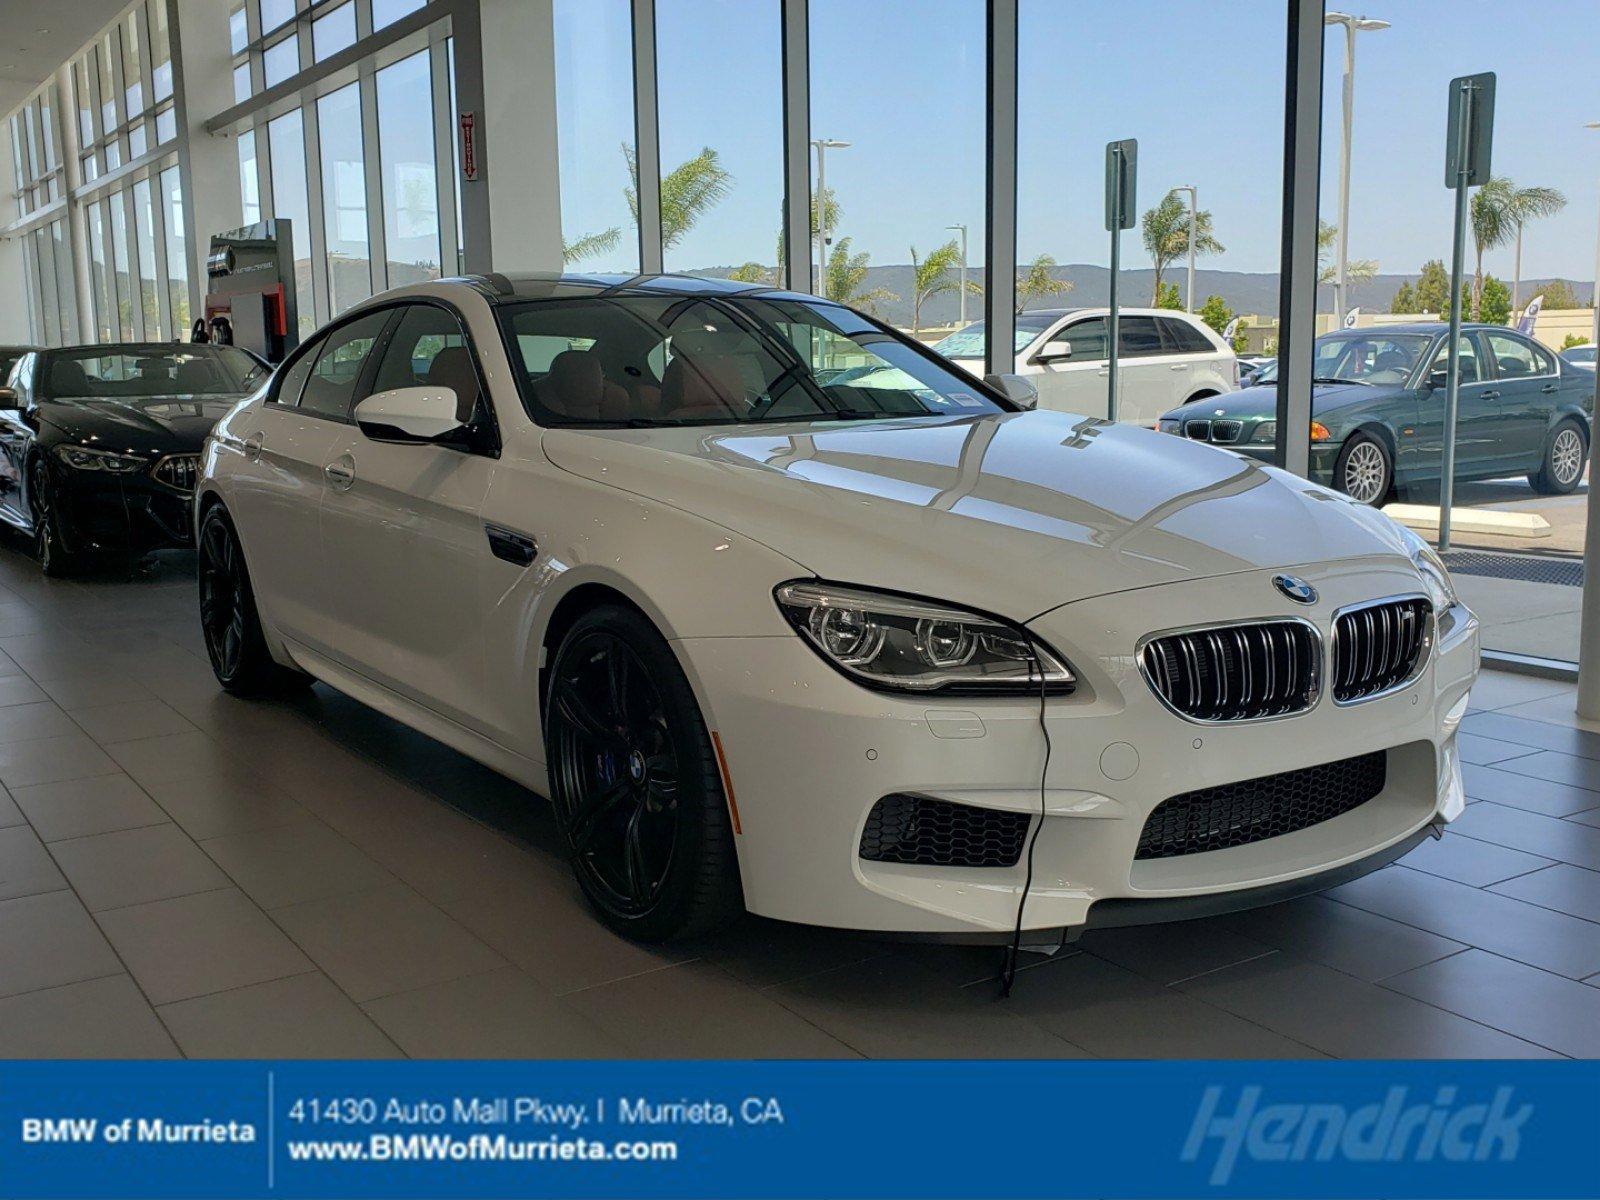 BMW M6 Gran Coupe >> New 2019 Bmw M6 Gran Coupe Rwd Sedan